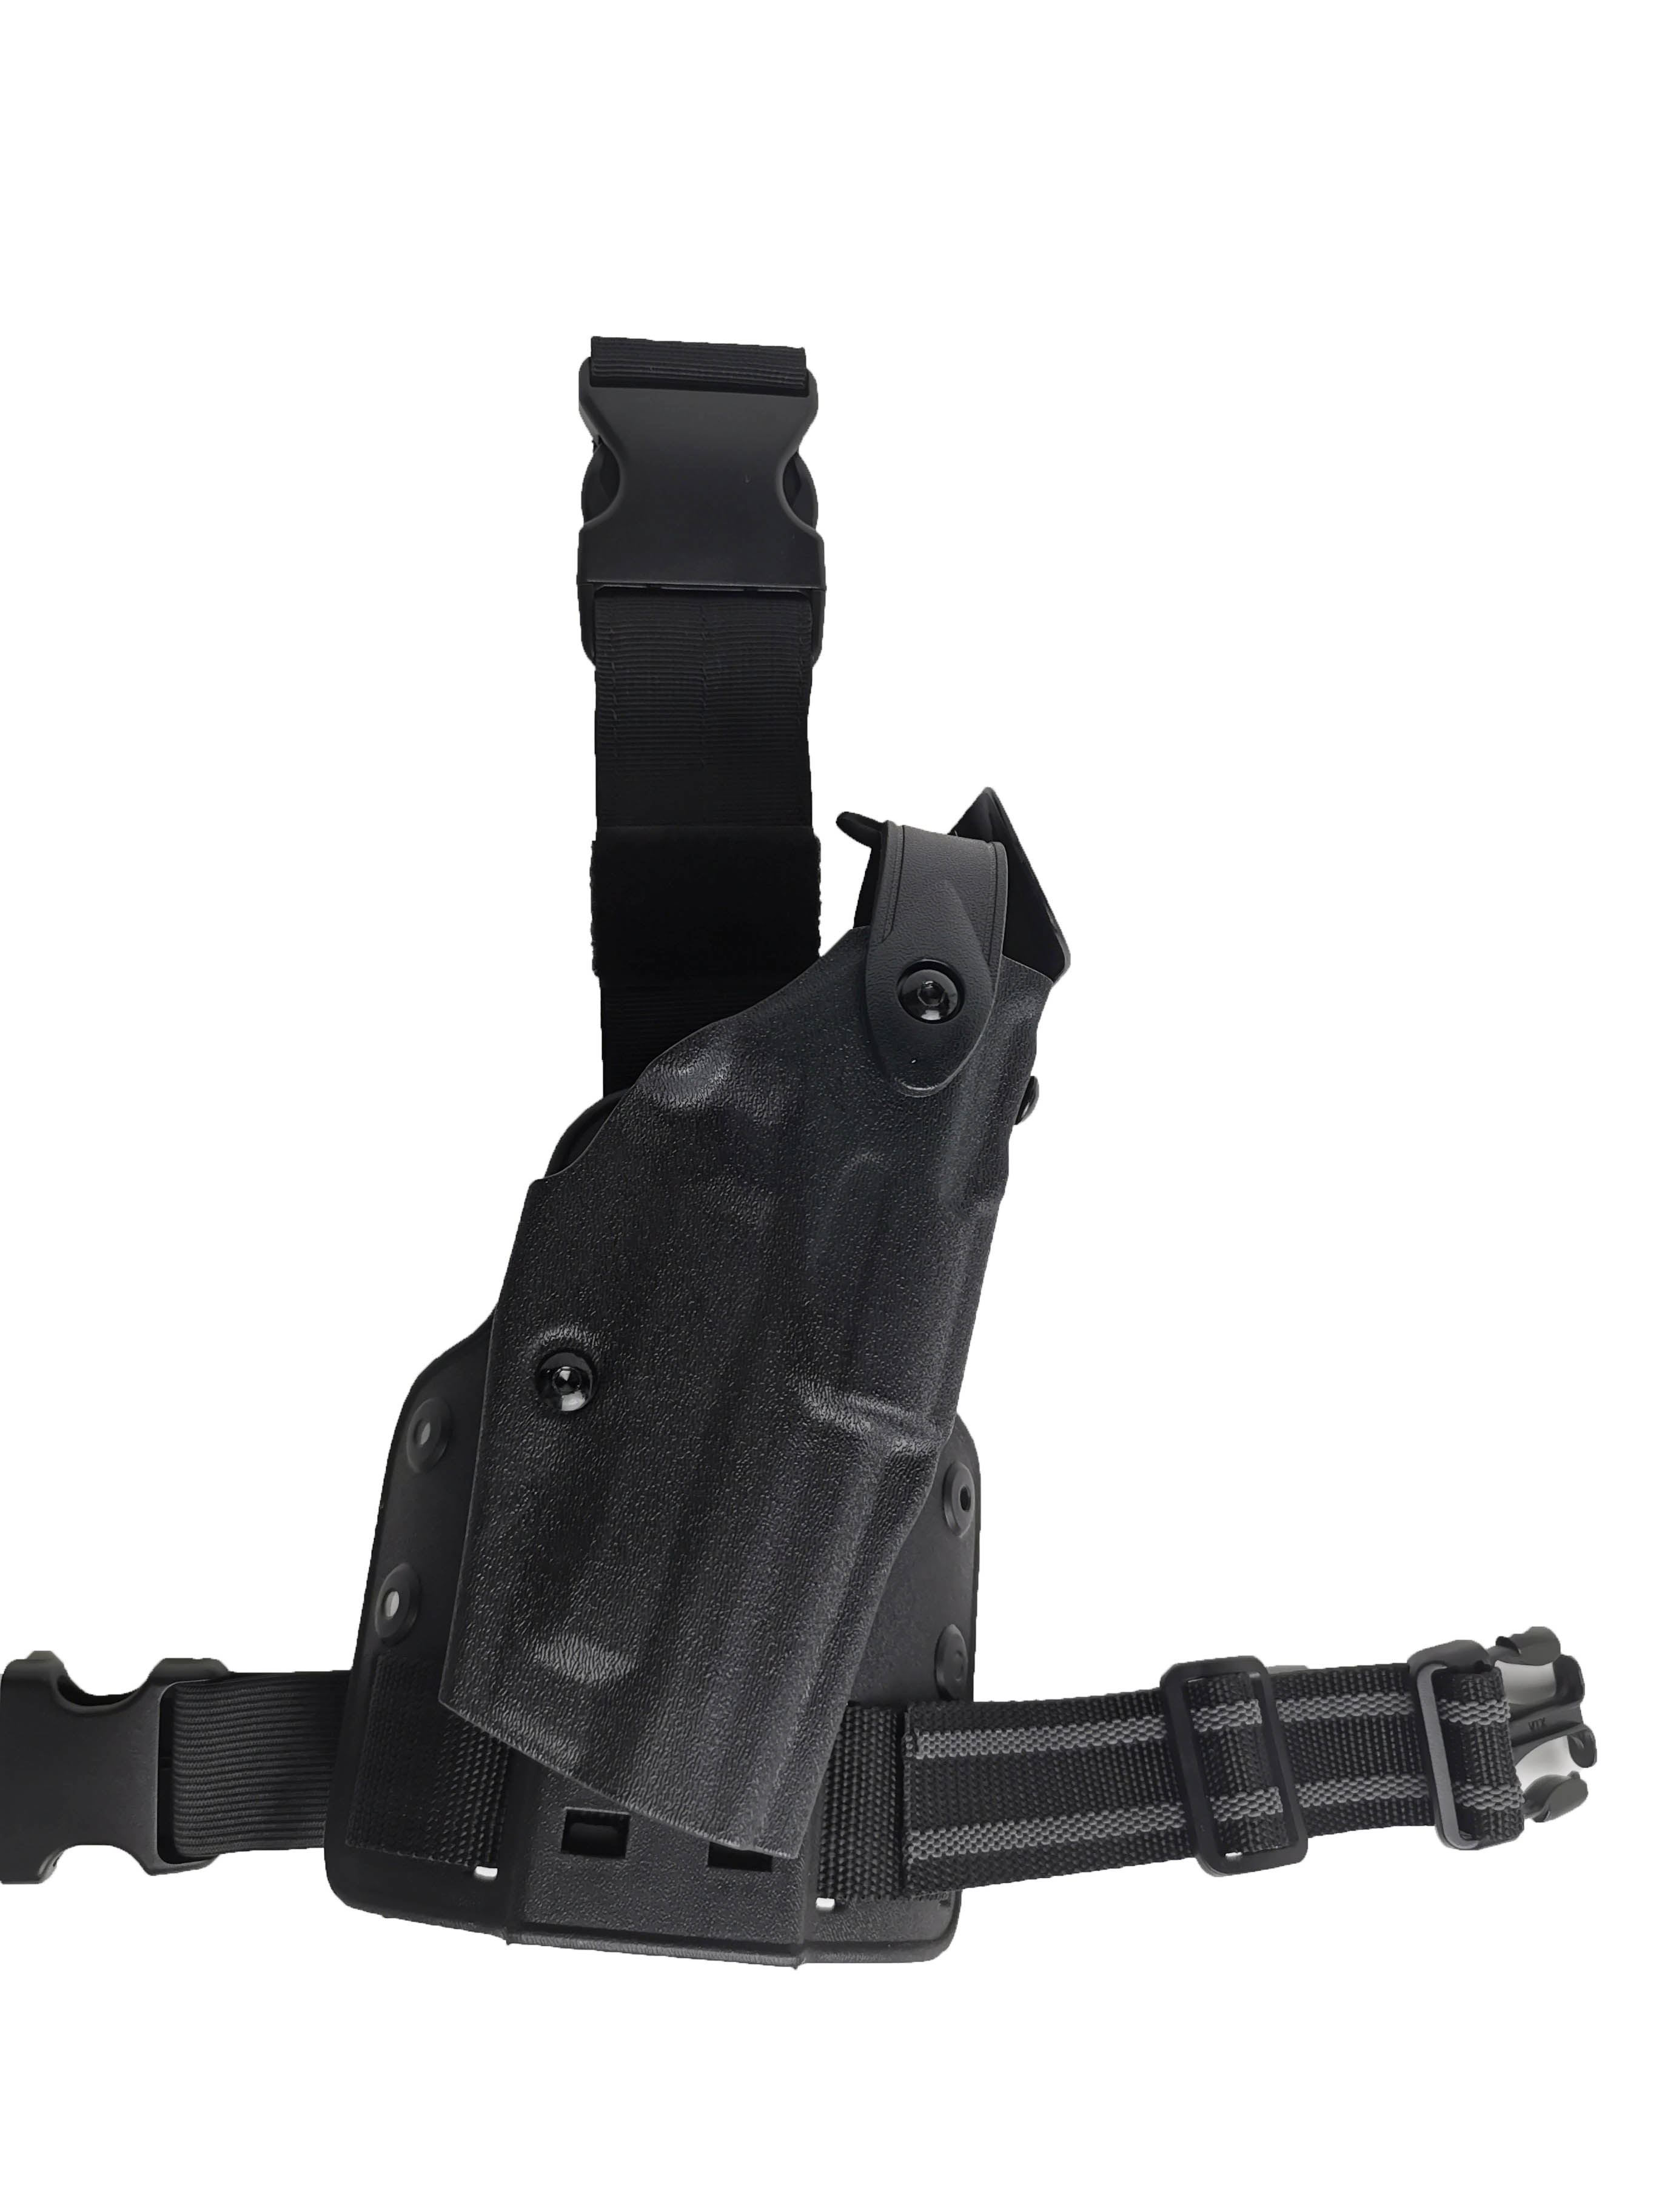 Adjustable Tactical Universal Drop Leg Platform Holster W//Quick Release Straps